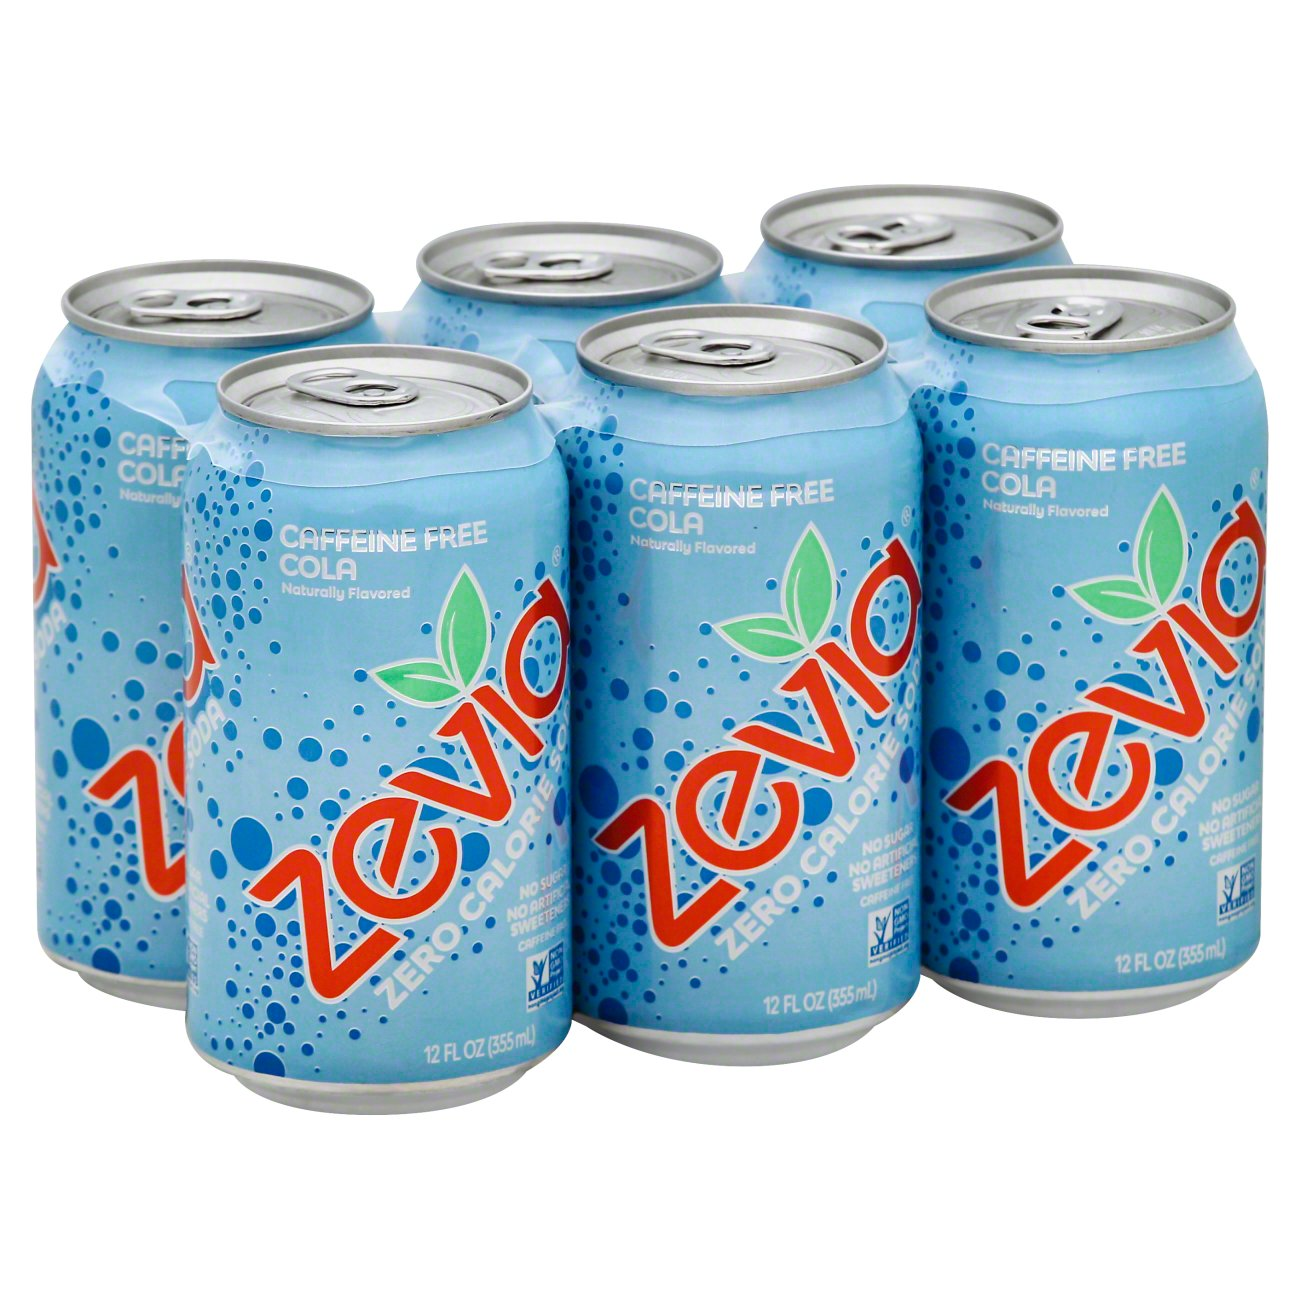 zevia cola diet caffeine free